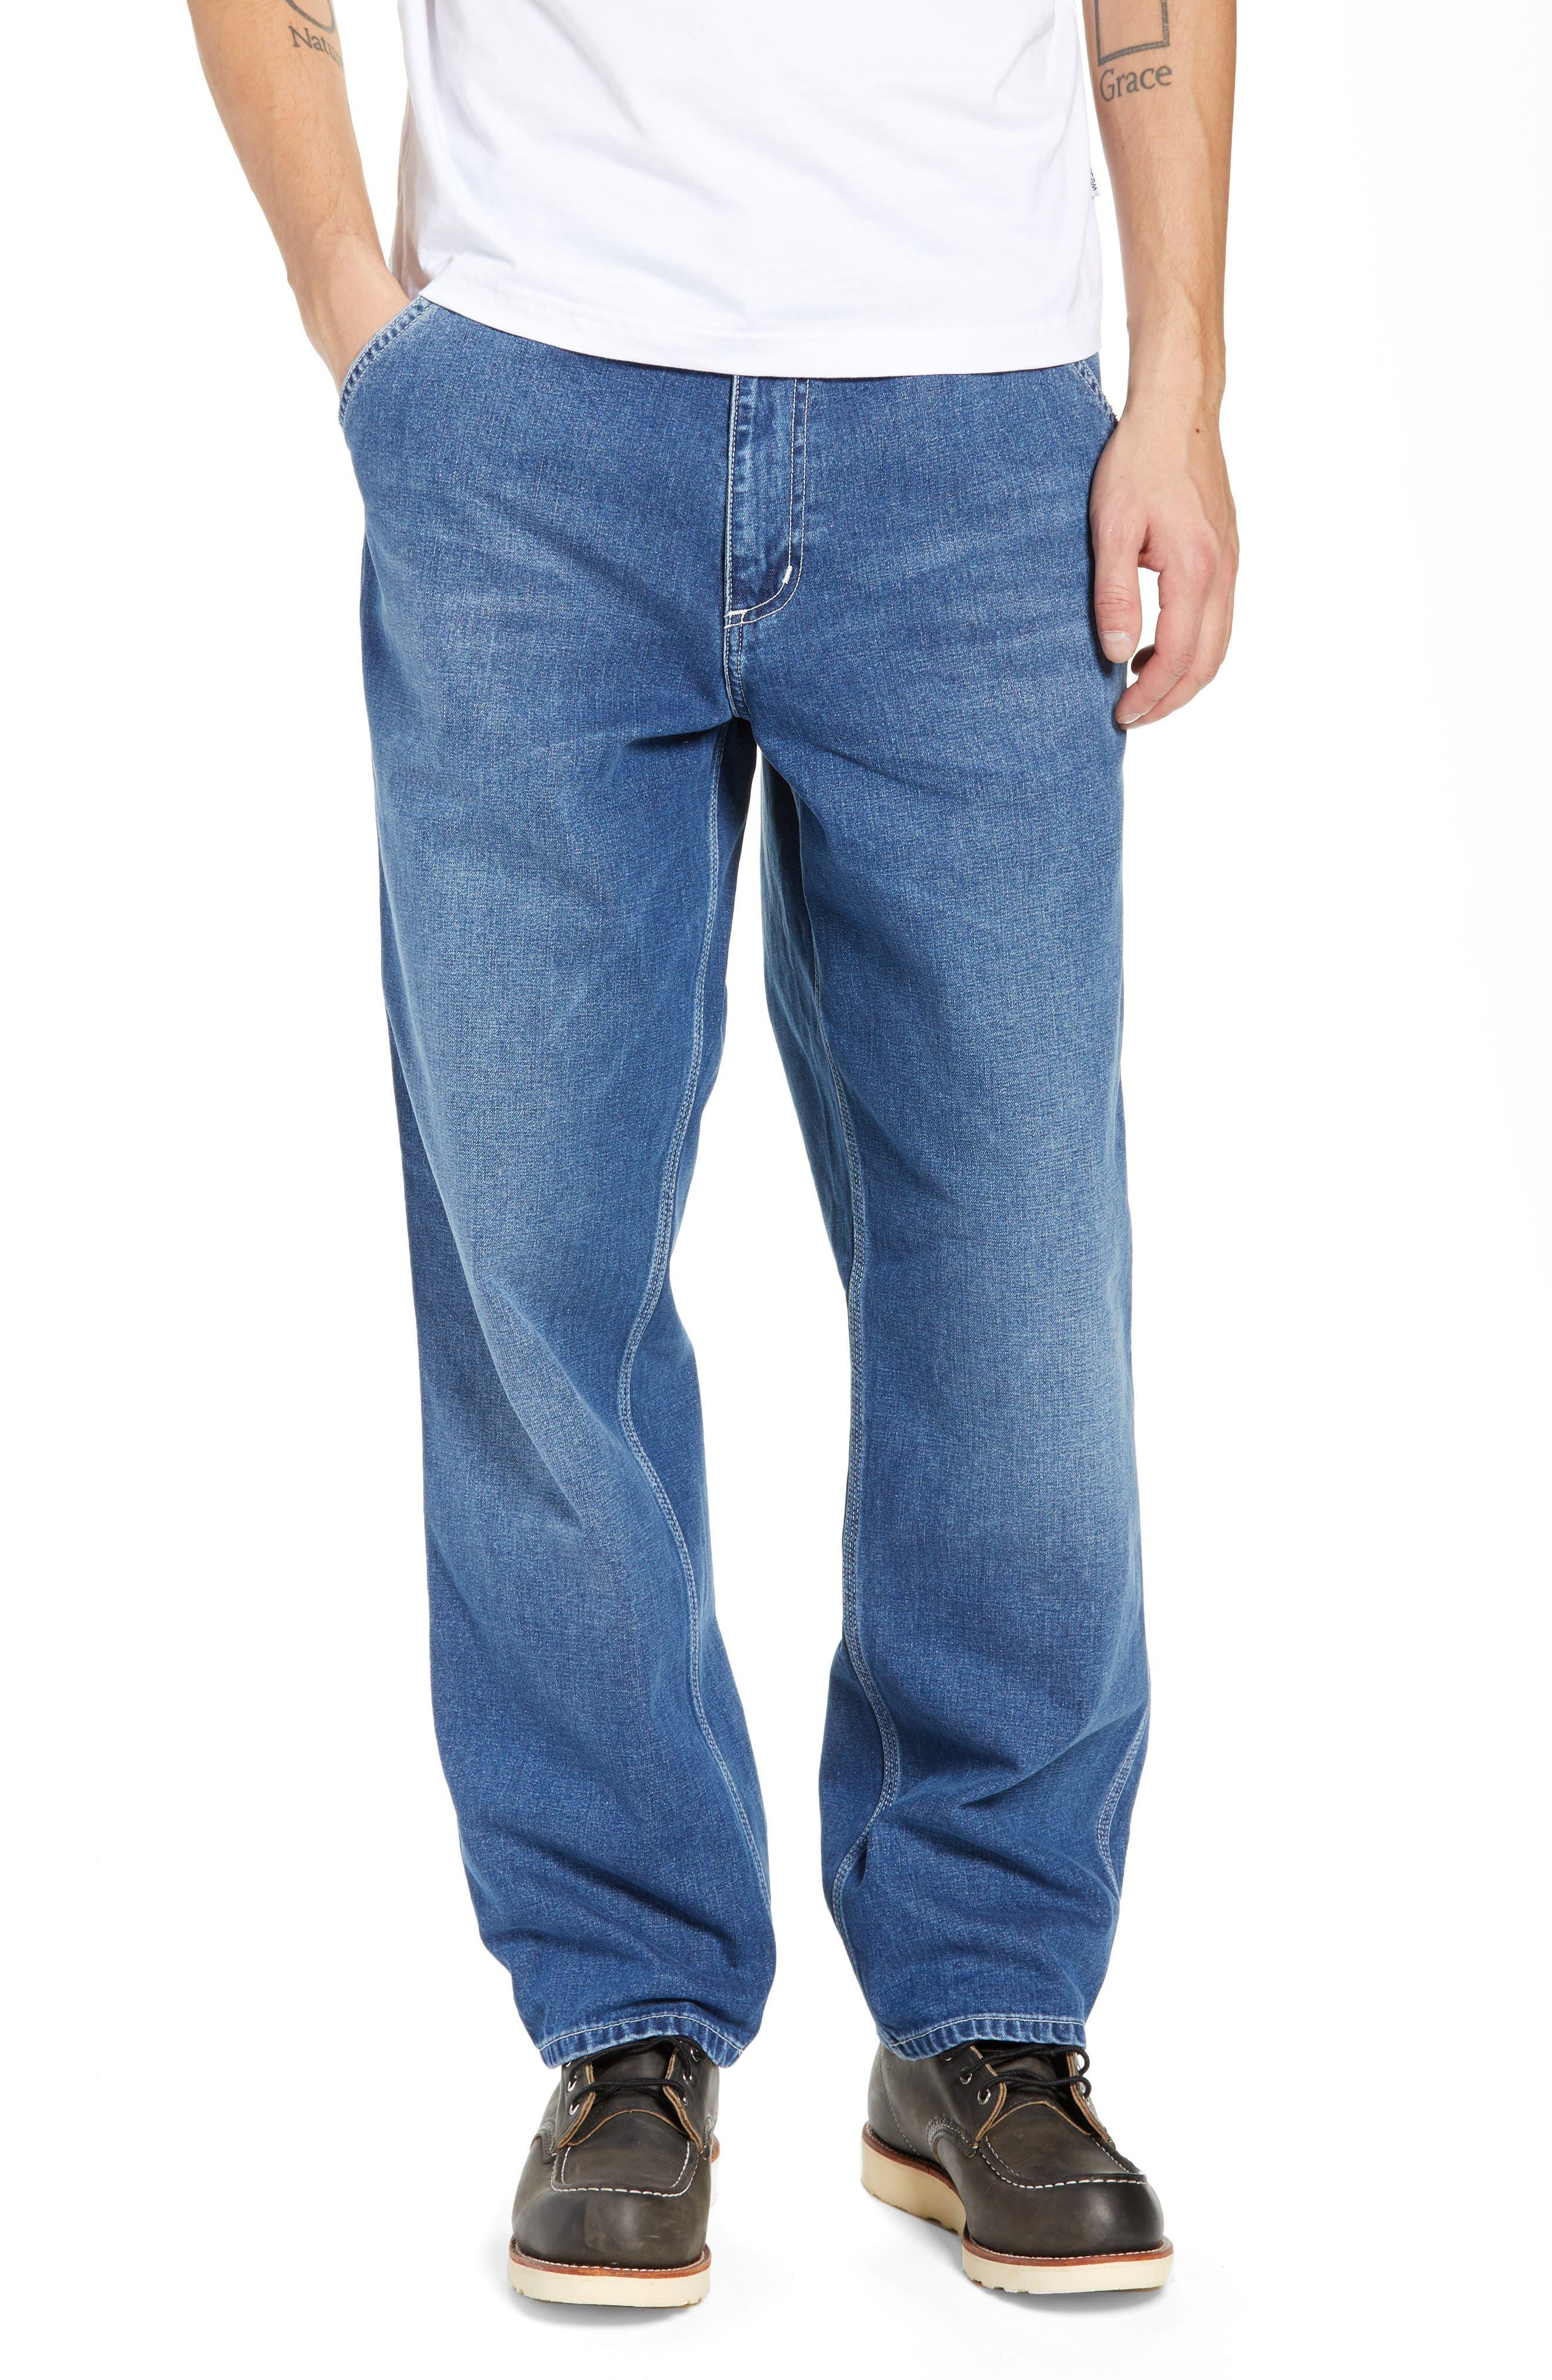 CARHARTT WORK IN PROGRESS,                             Simple Denim Jeans,                             Main thumbnail 1, color,                             BLUE